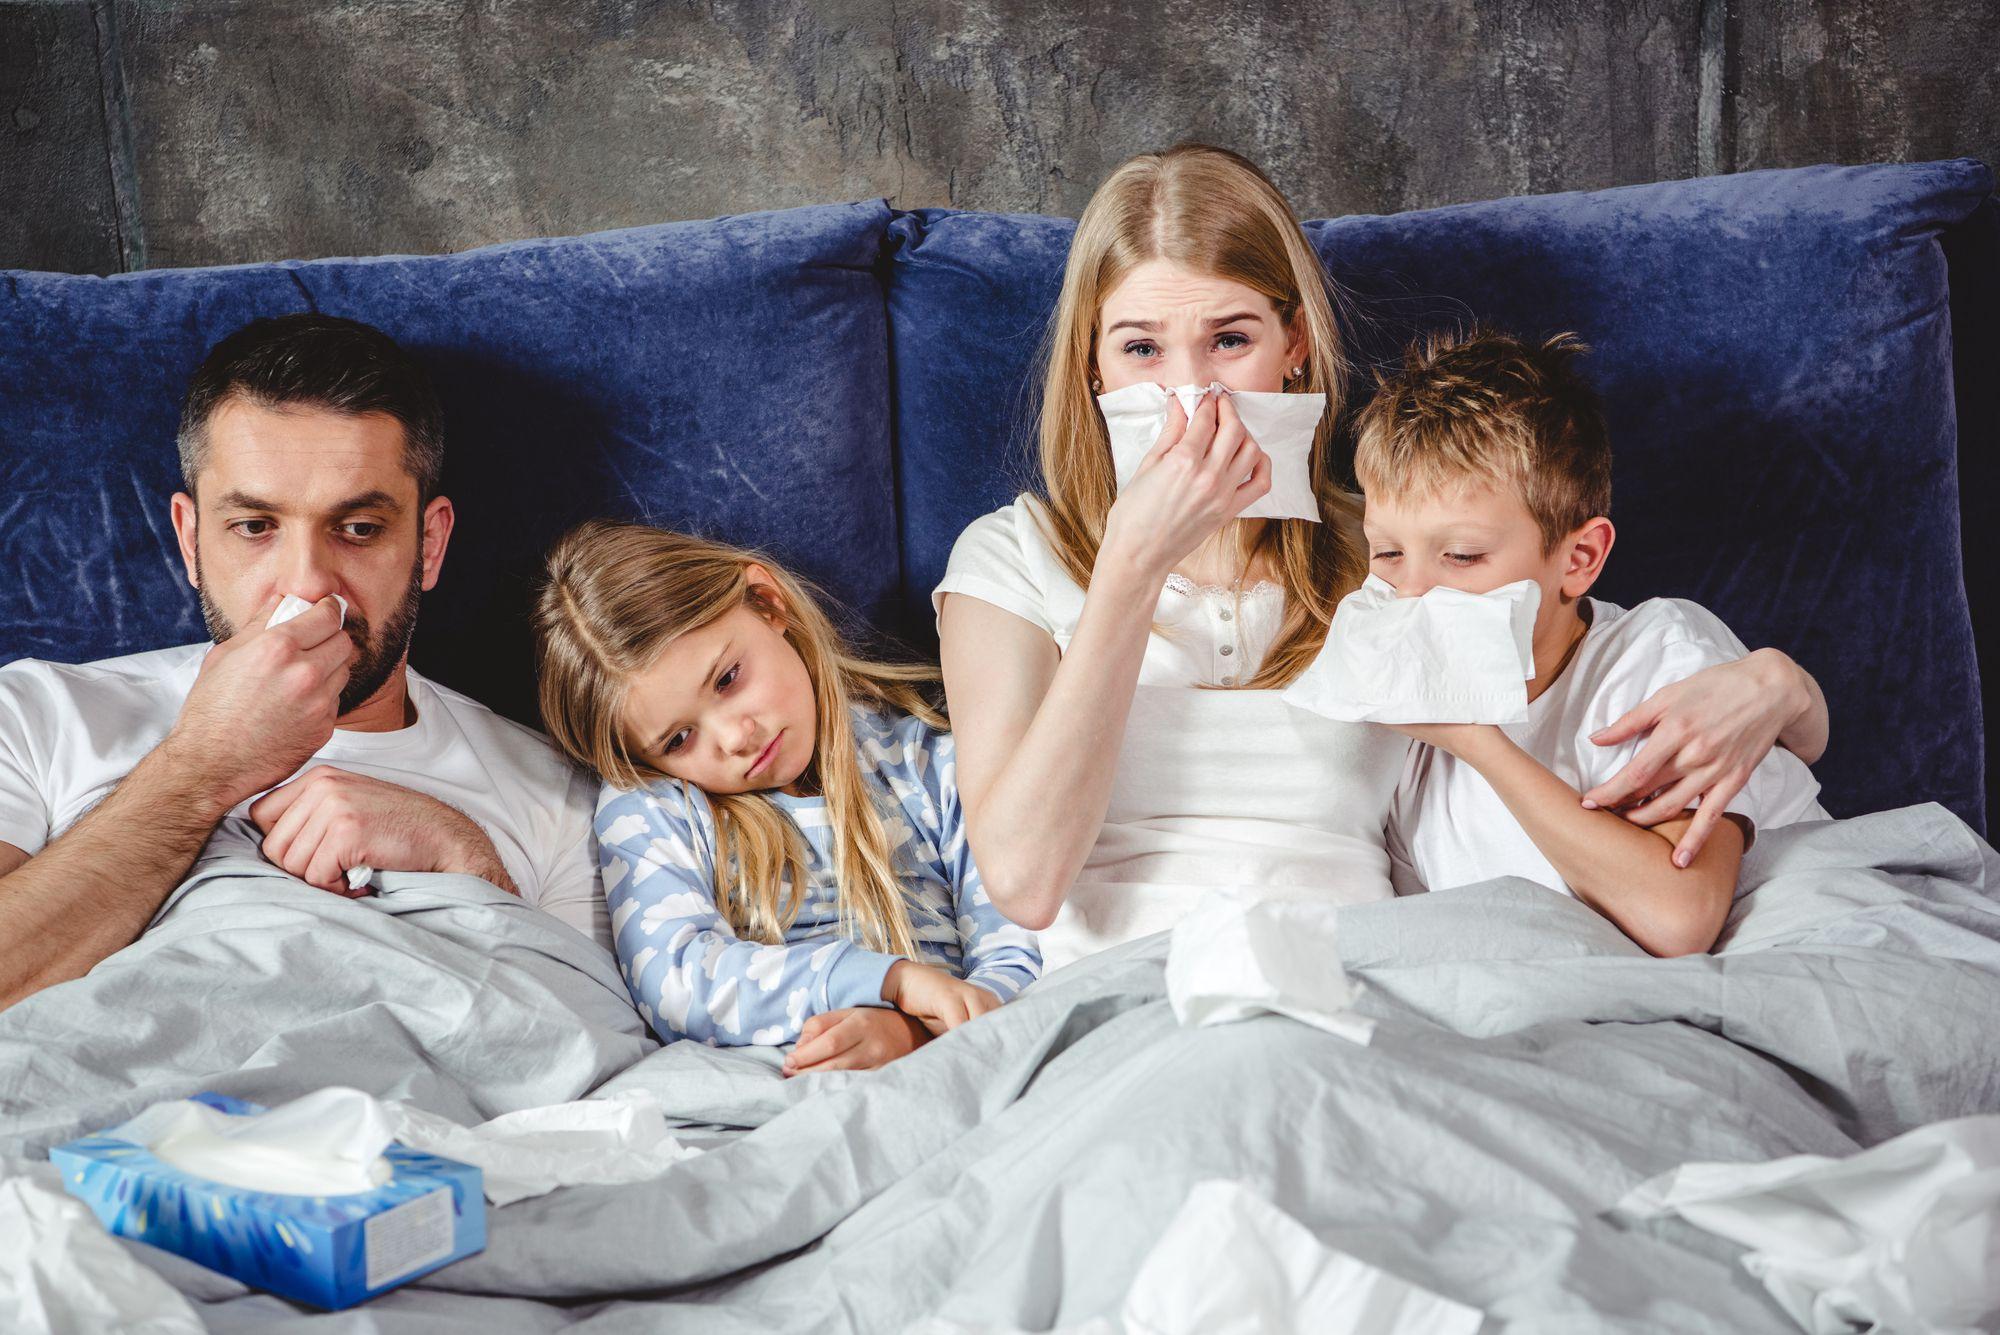 imunidade baixa